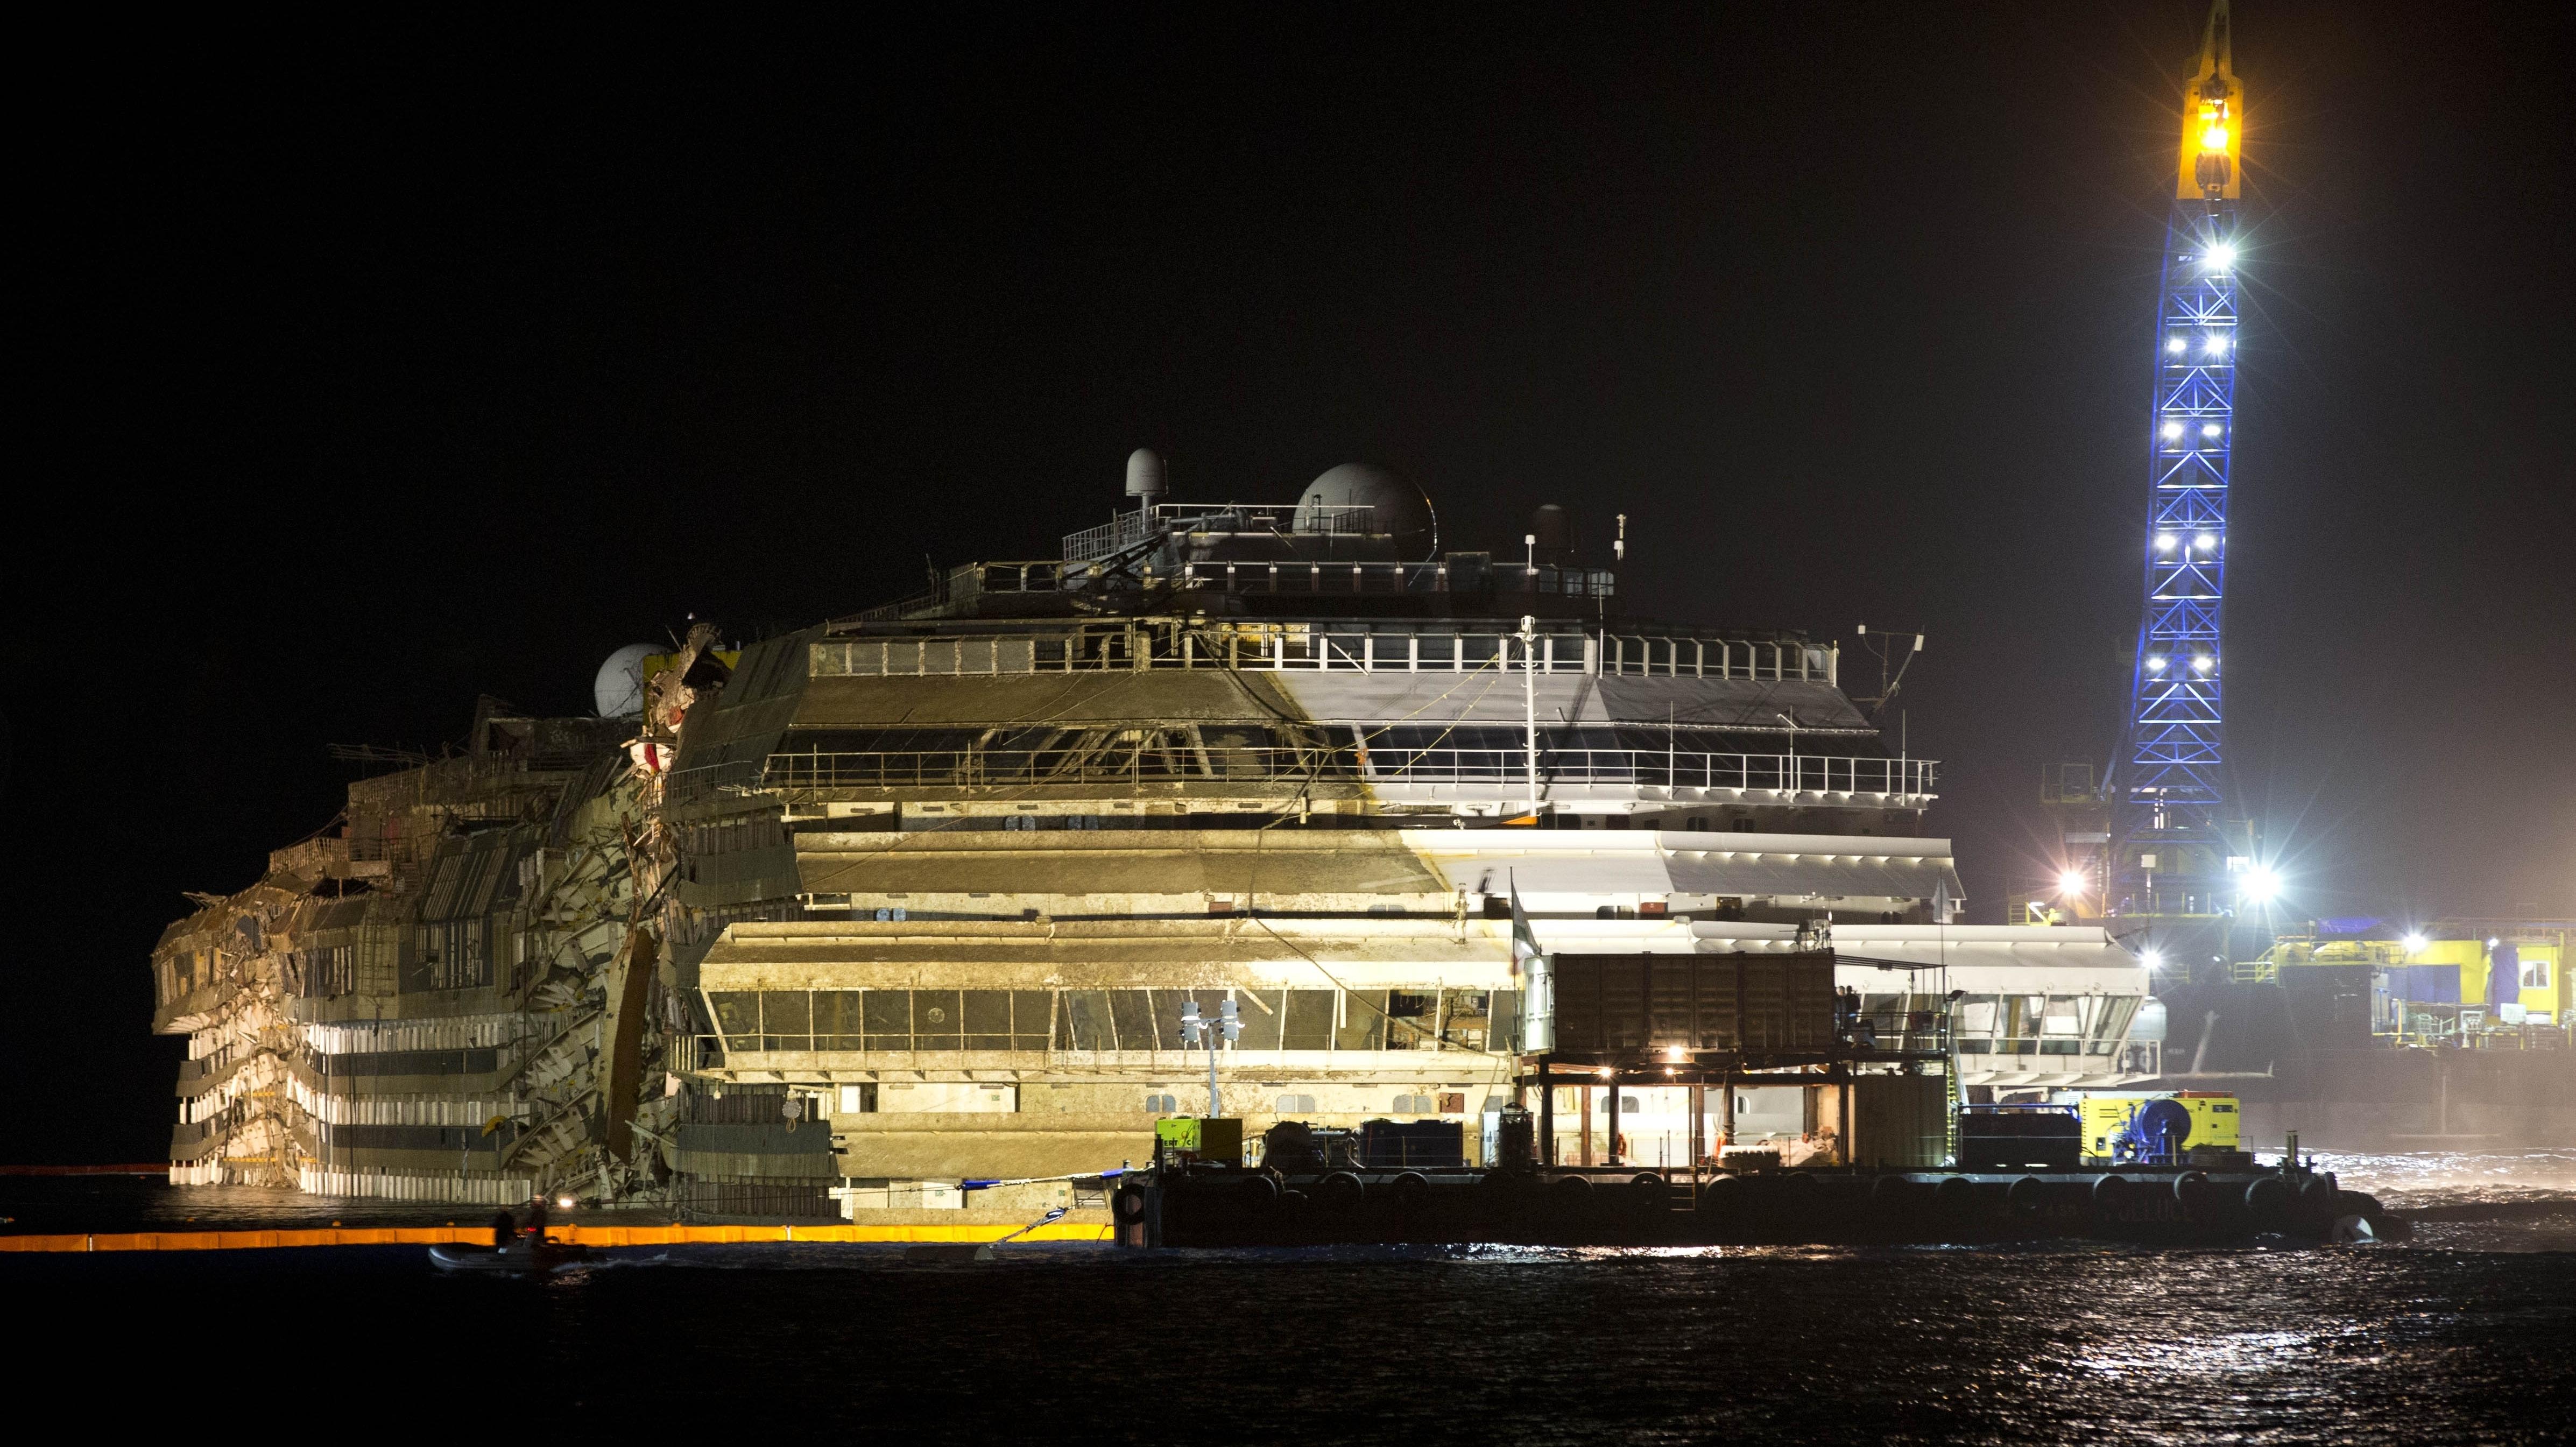 Mission Success: Costa Concordia Is Vertical